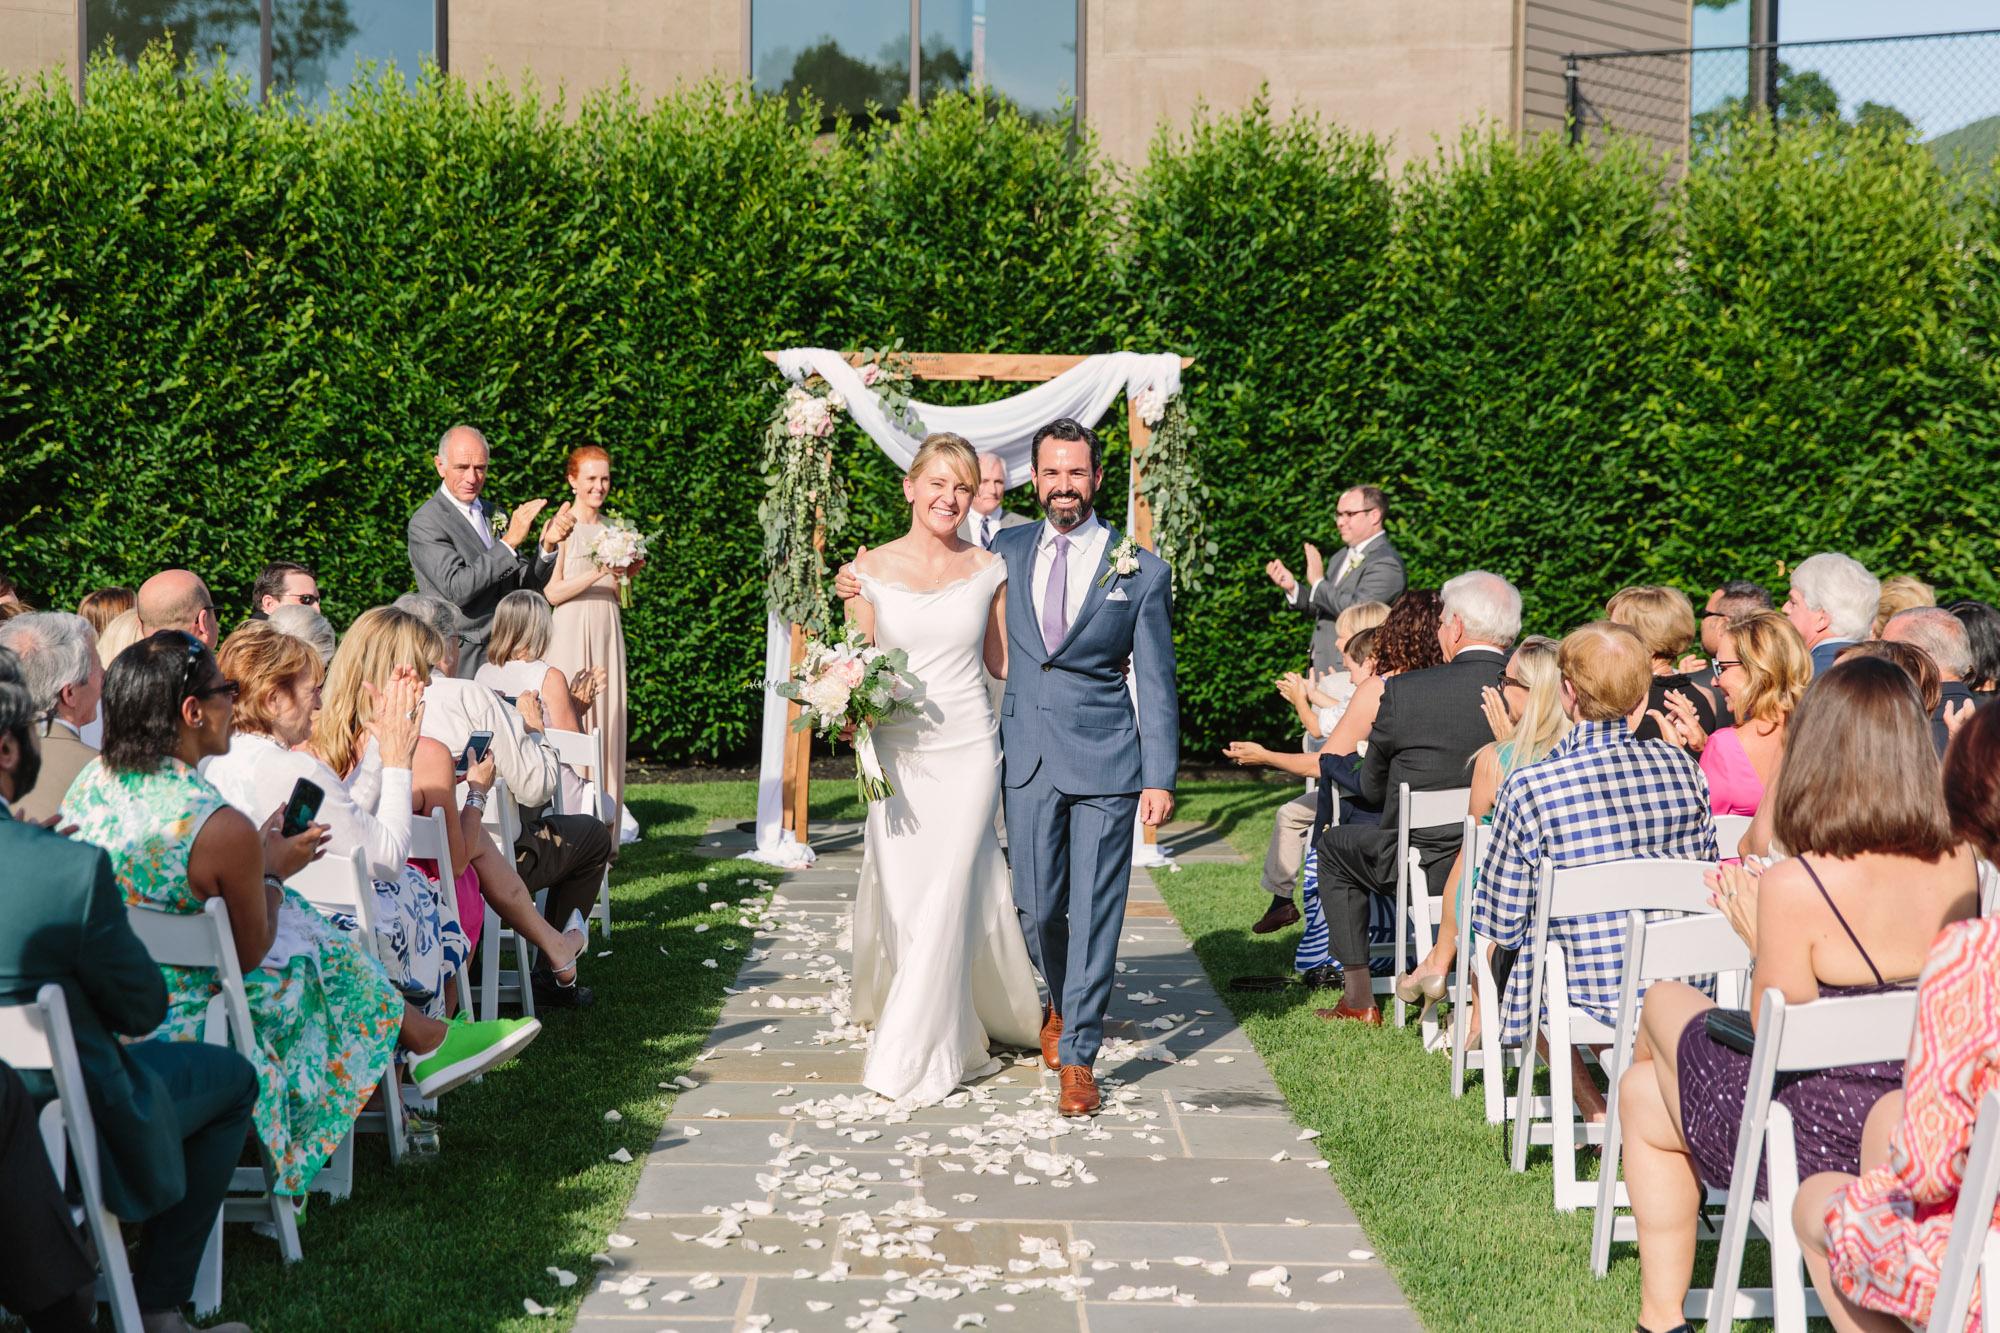 49_Rowan_Brian_The_Roundhouse_Wedding_Beacon_NY_Tanya_Salazar_Photography_602.jpg